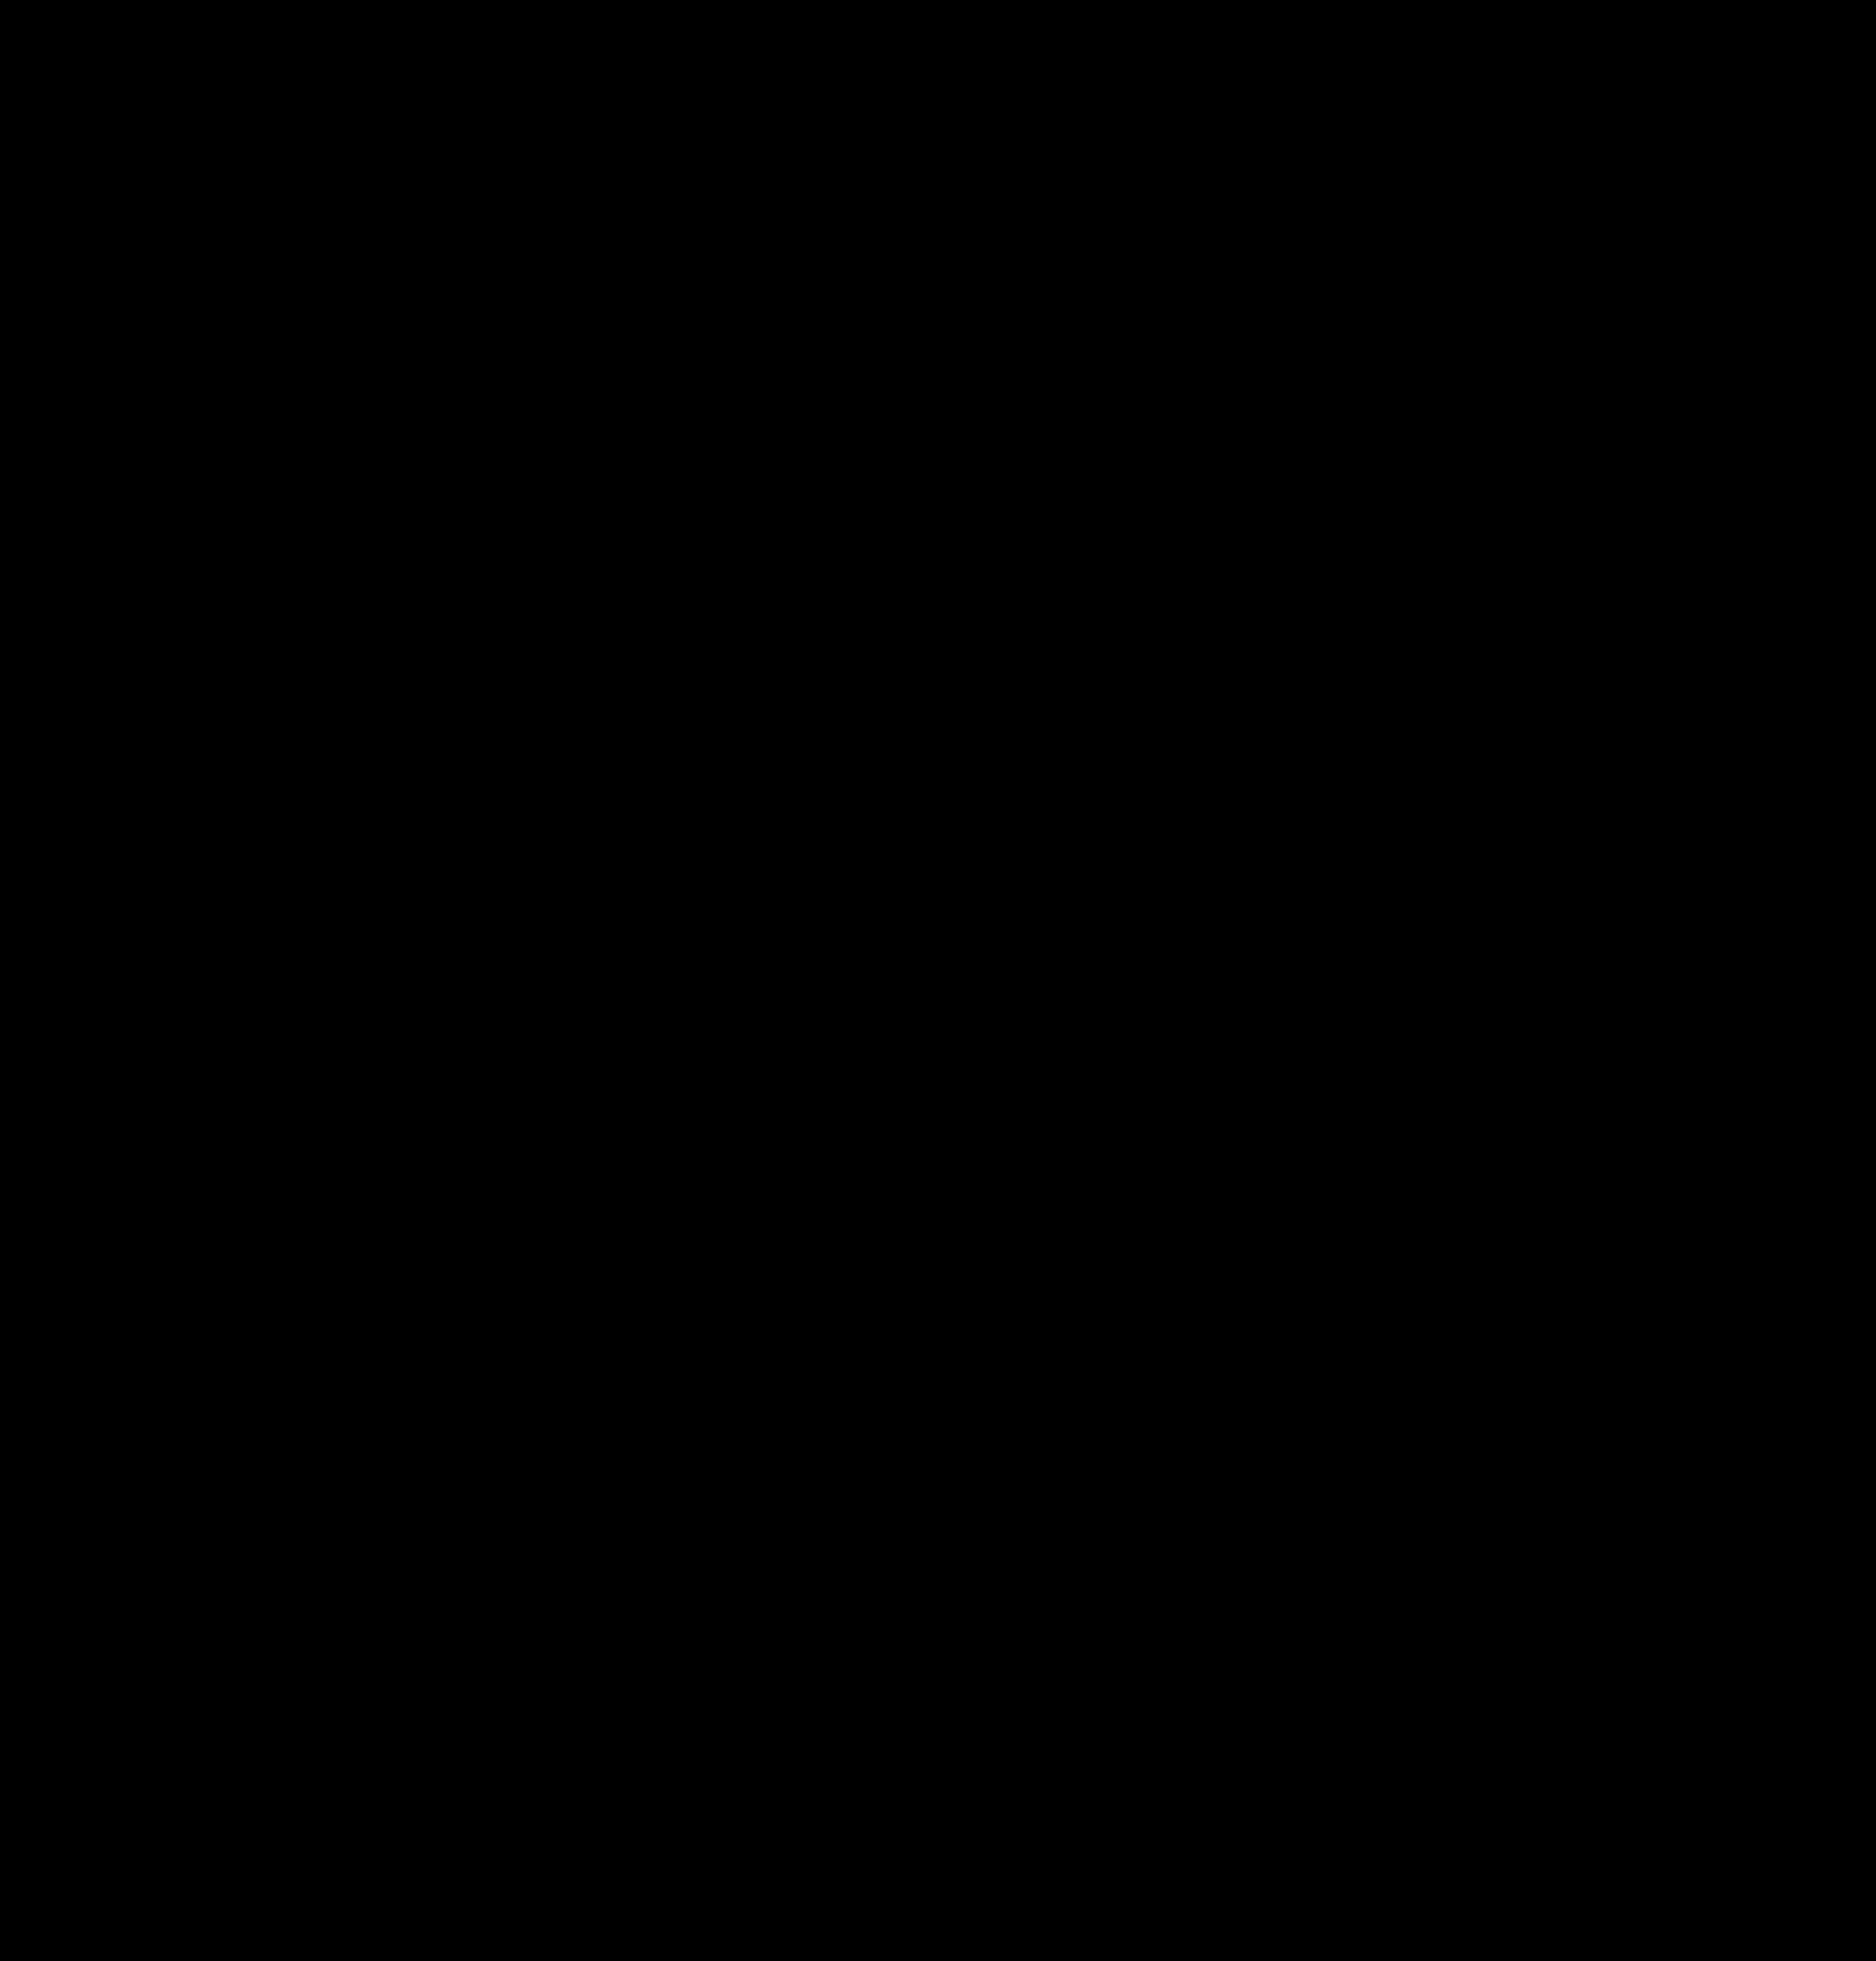 2296x2400 Clipart